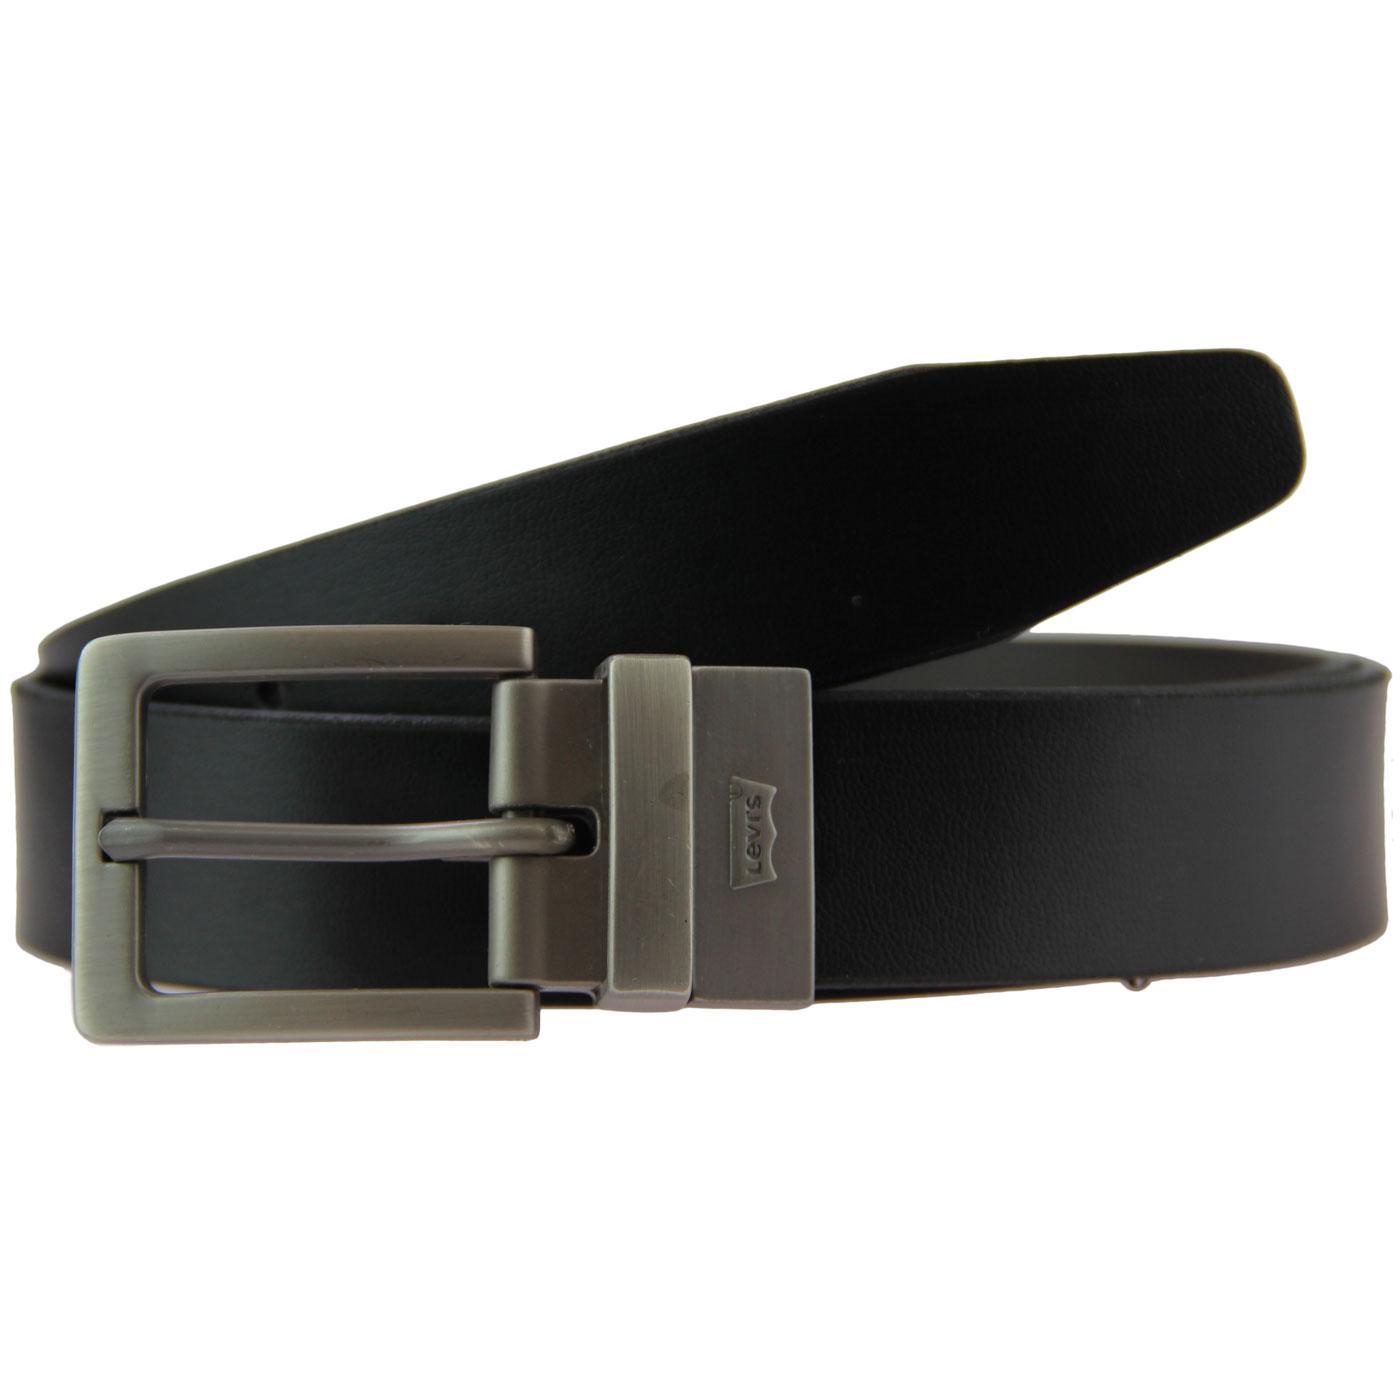 Big Bend LEVI'S Retro Reversible Belt BLACK/BROWN